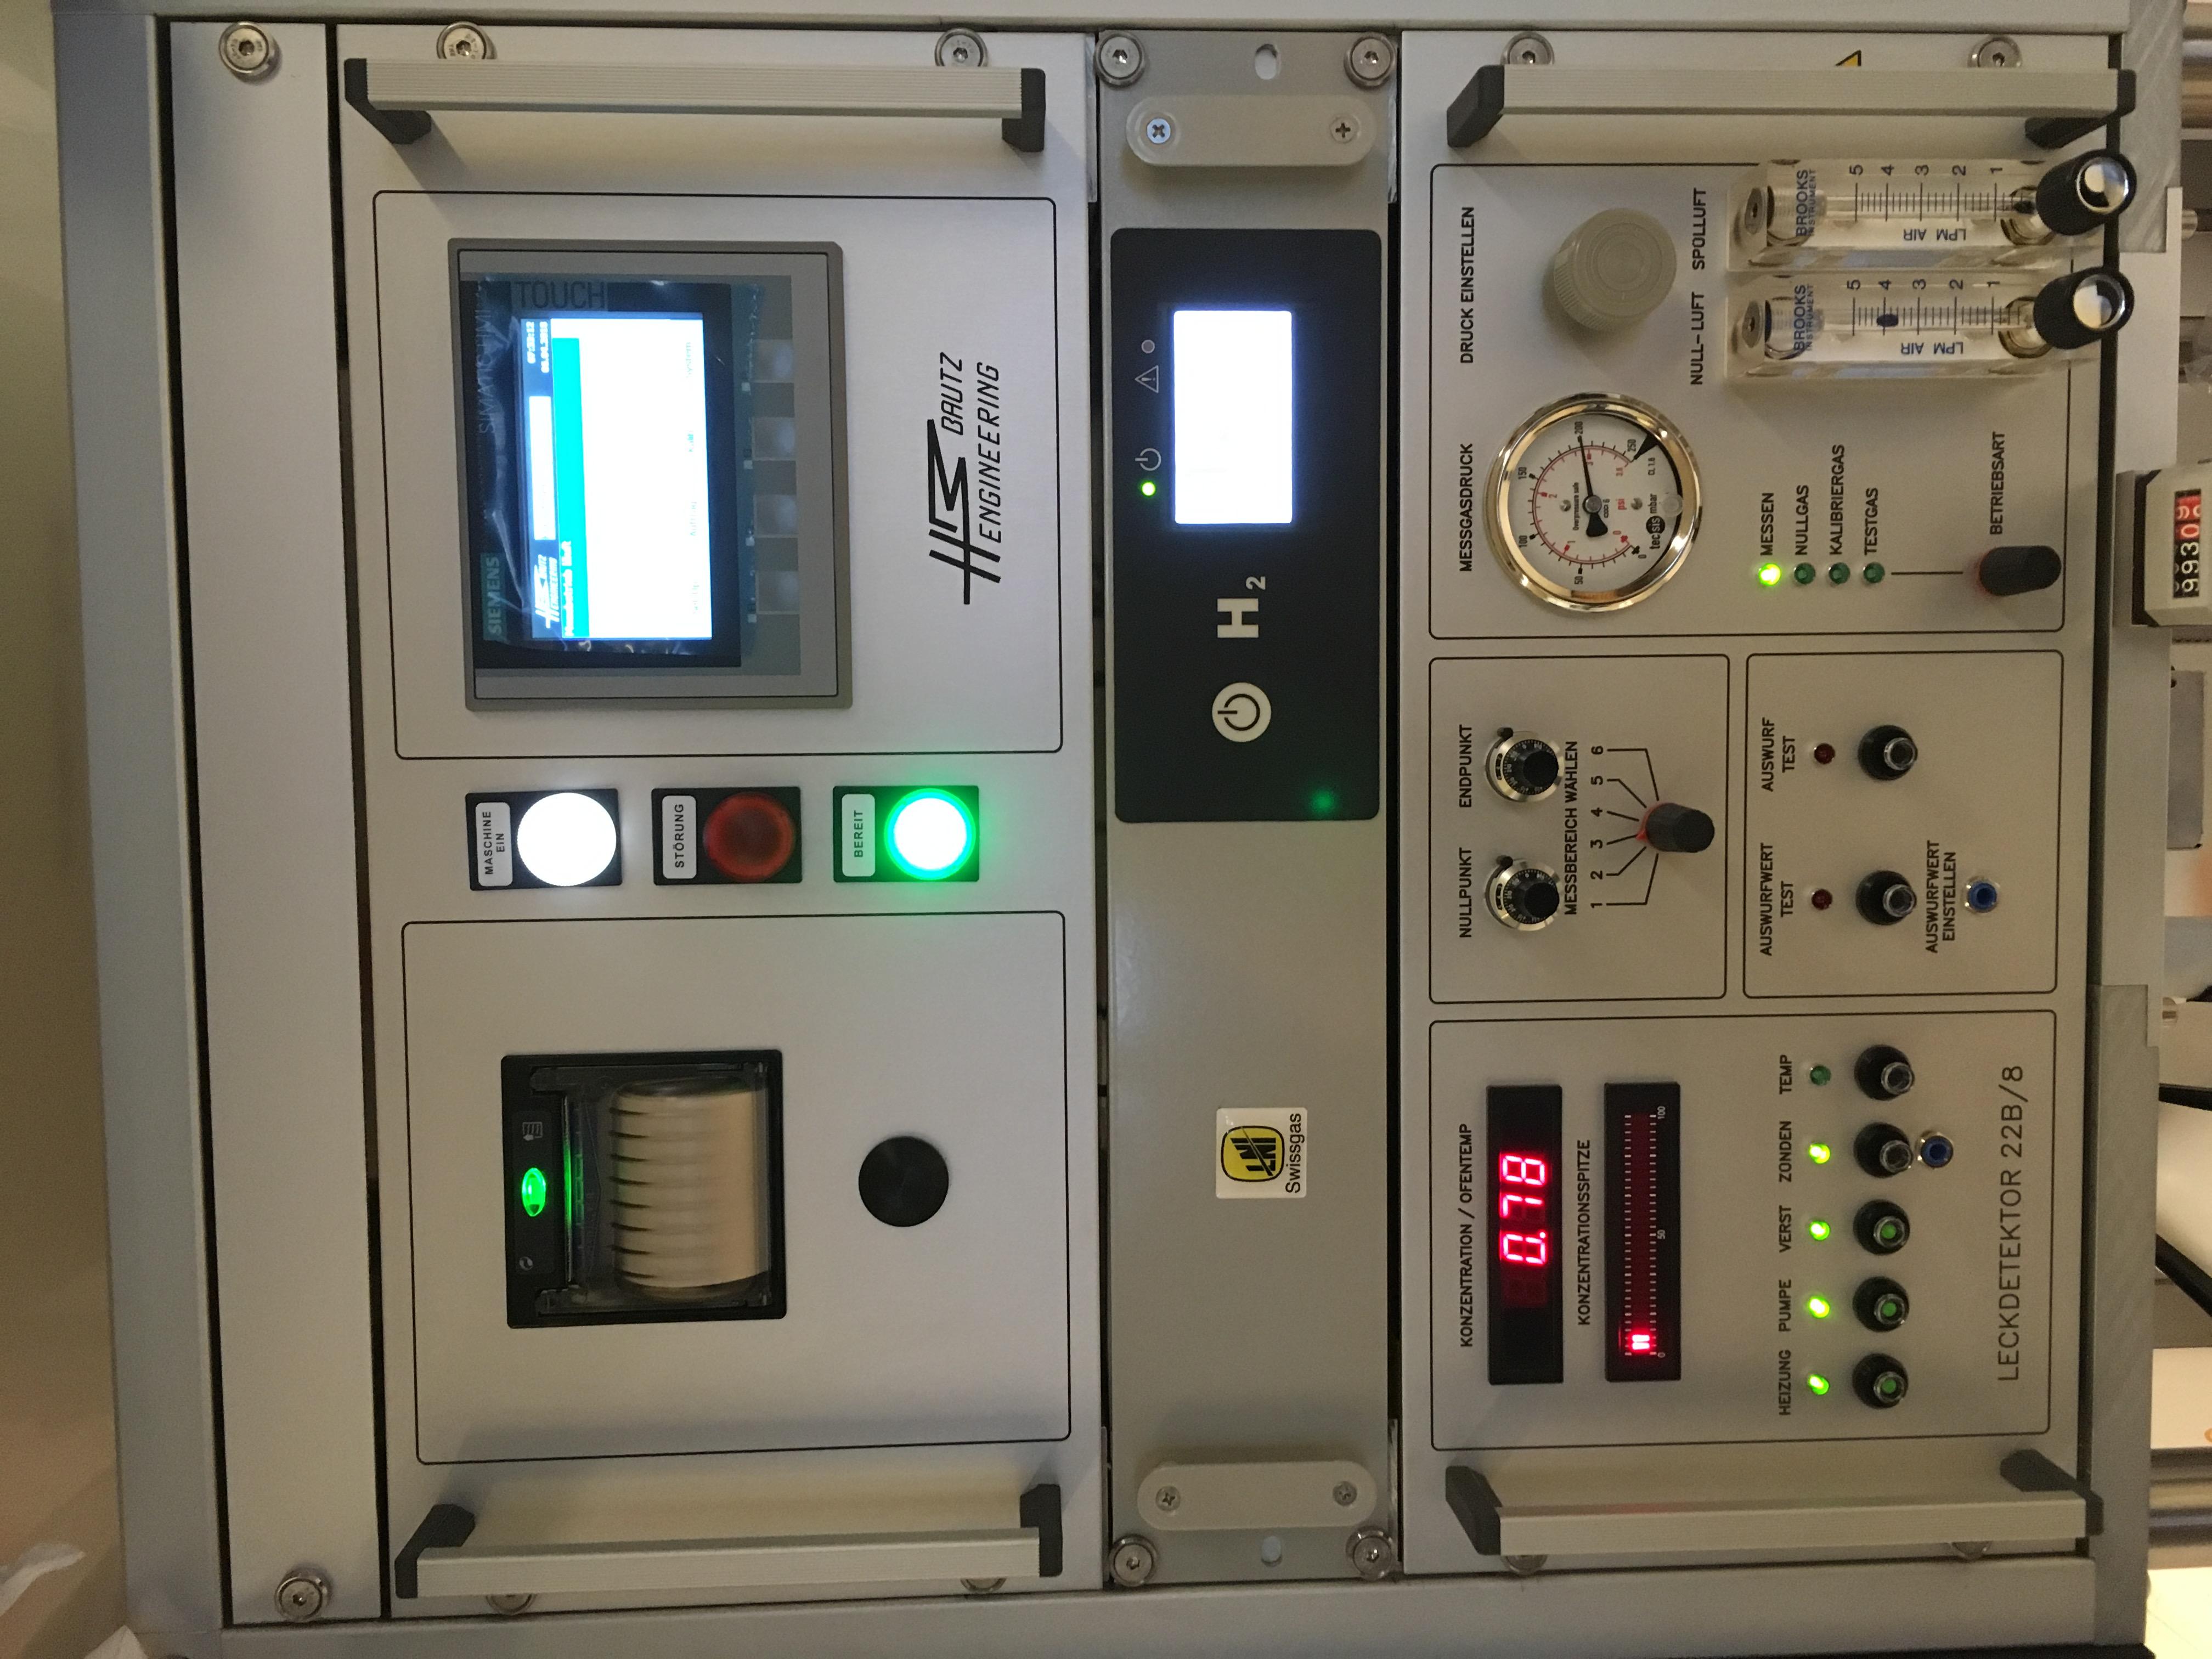 Aerofid Control Panel Raupack UK and Ireland